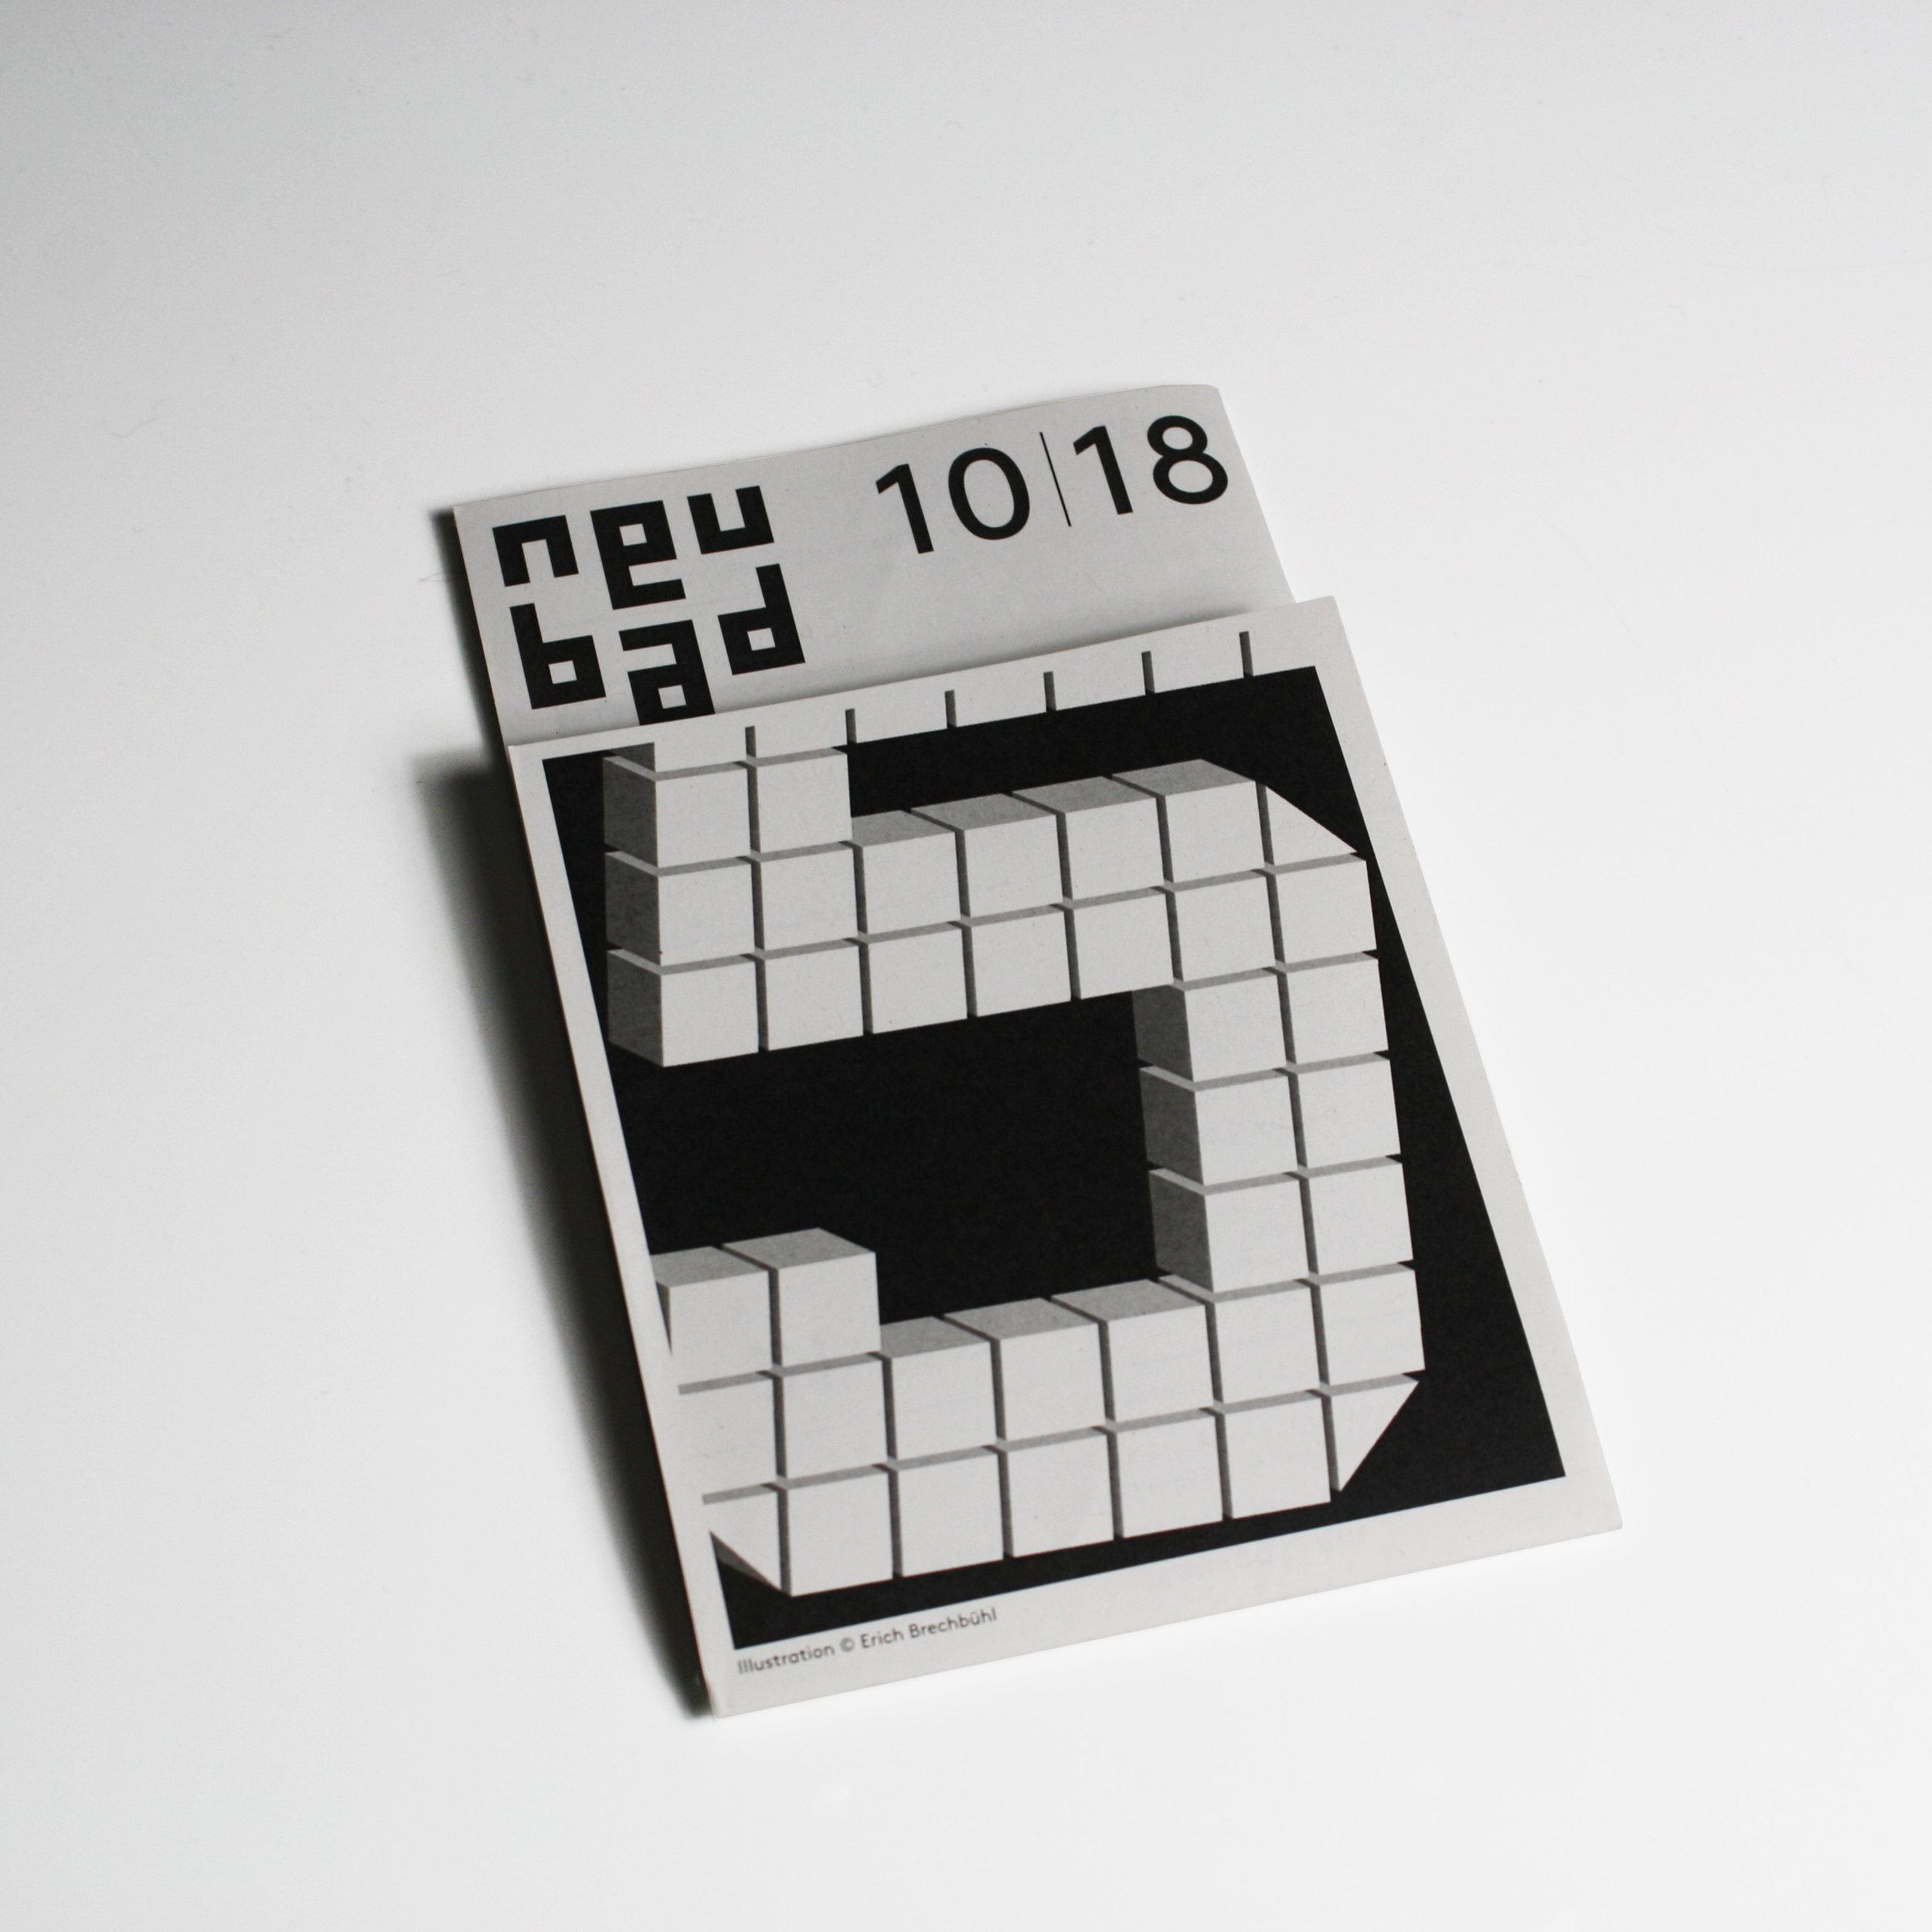 Neubad – Monatsprogramm | 2018